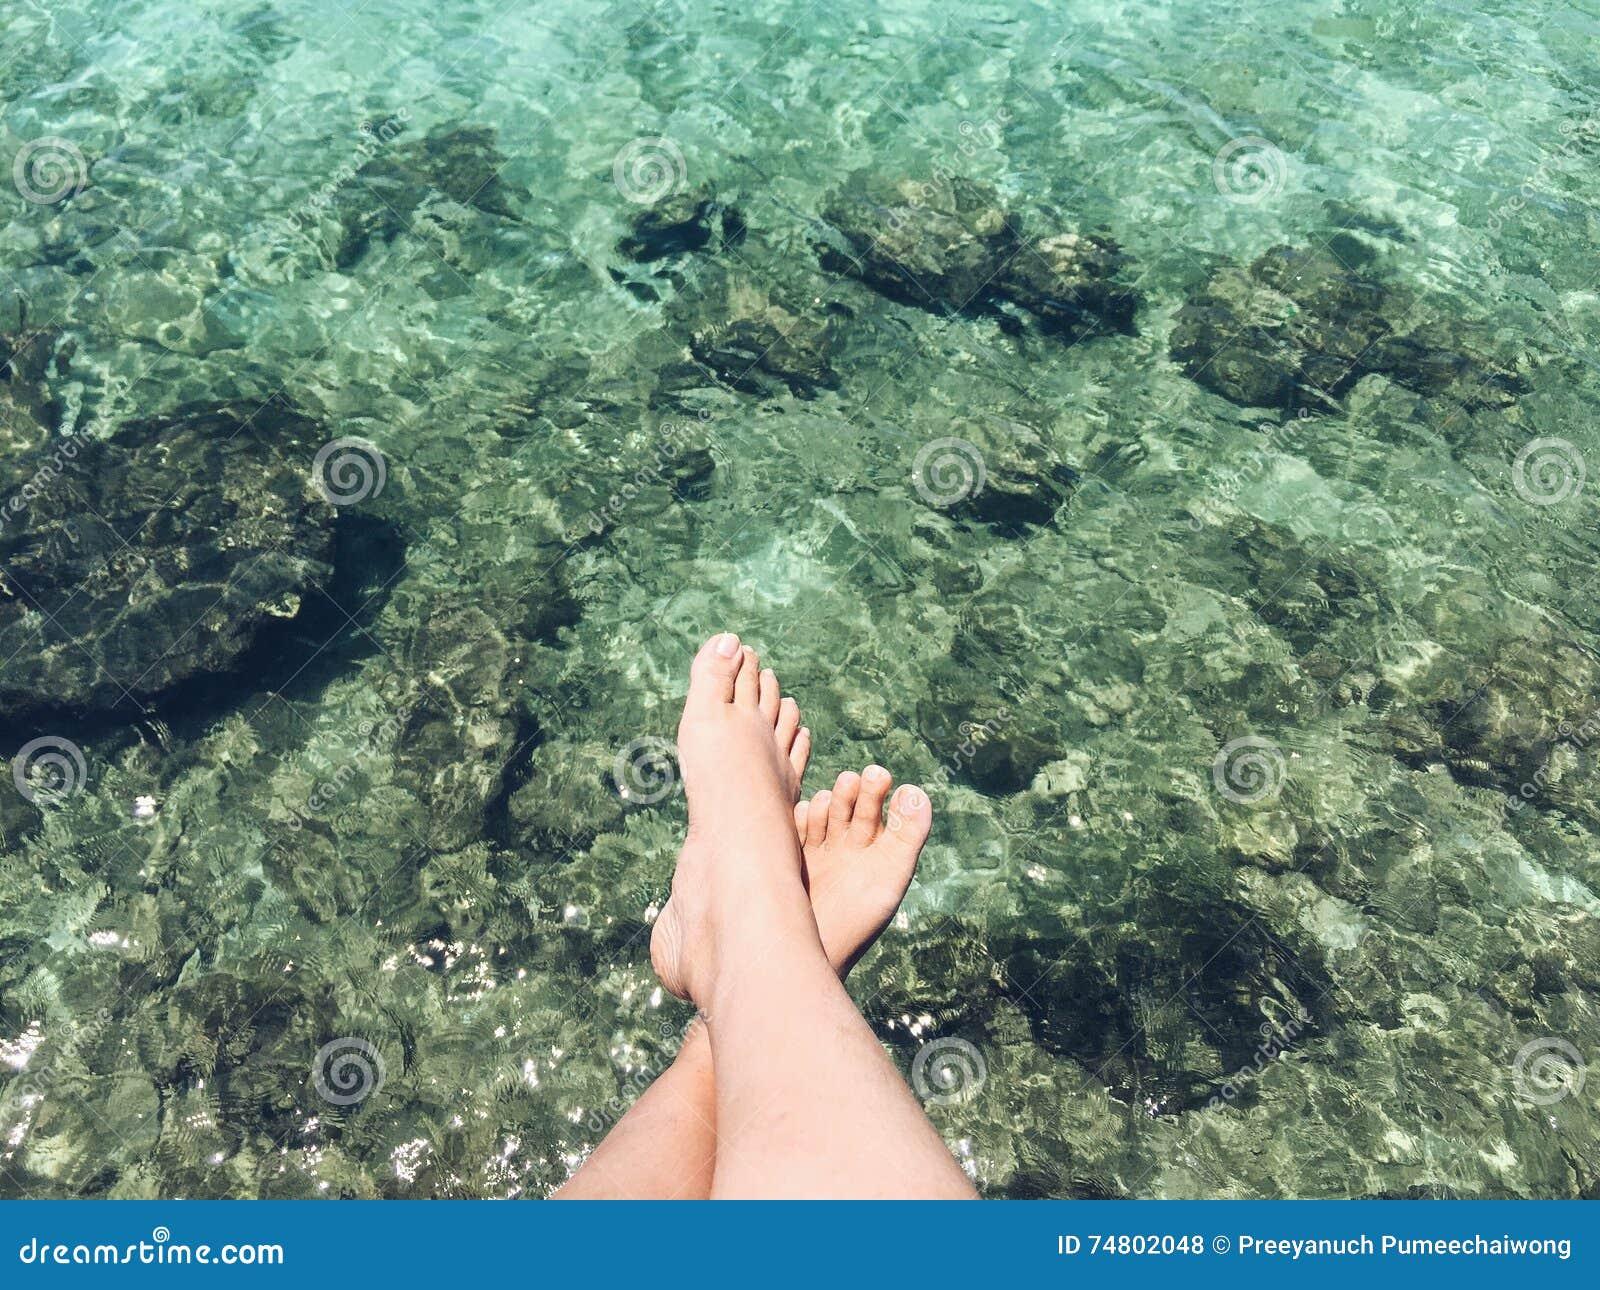 Feet dangling above water